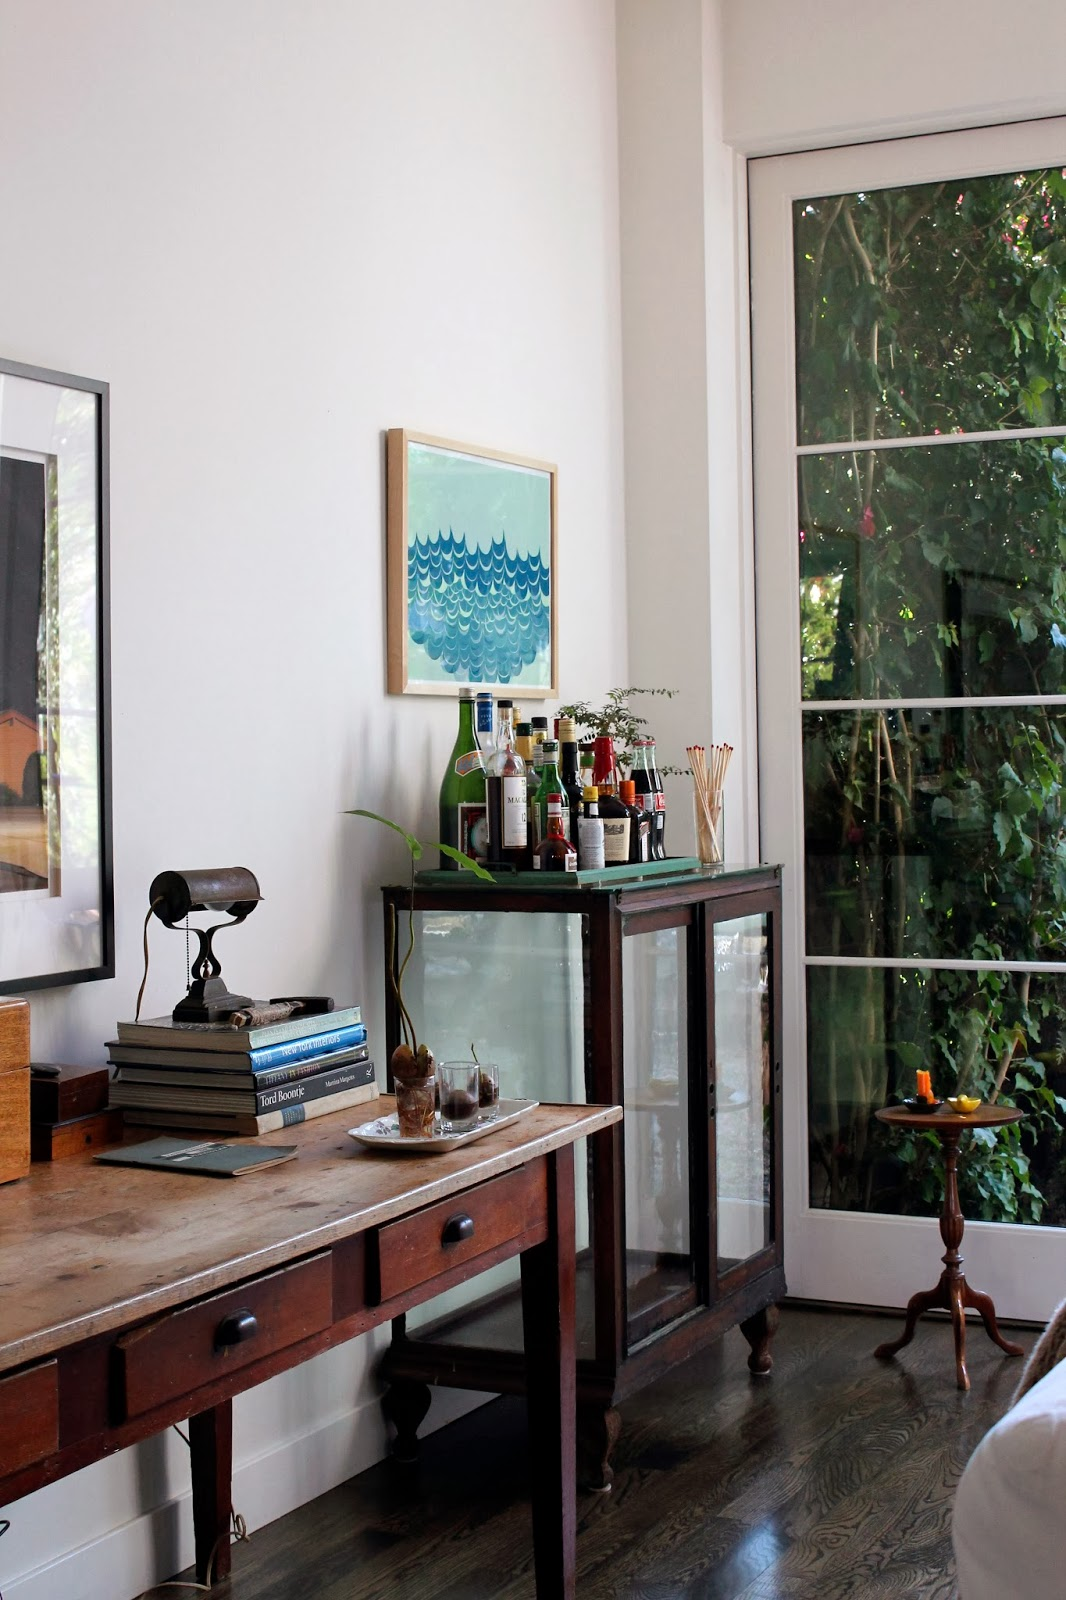 The Shingled House: Art